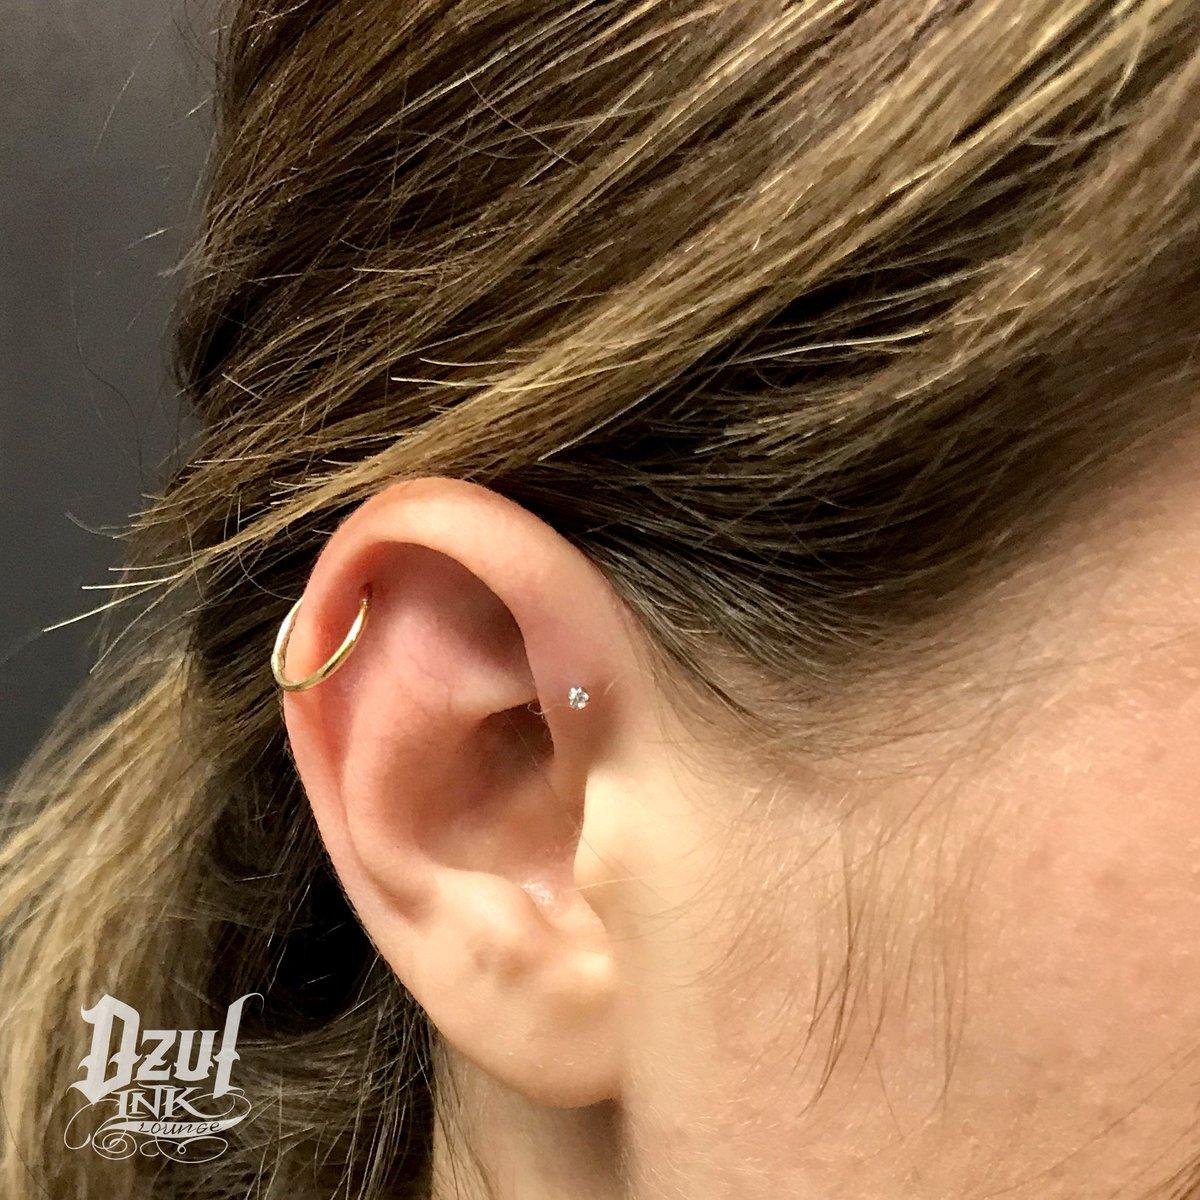 Incaton Tragus Earrings 16G 8mm Surgical Steel Cartilage Helix Triple Helix Piercing Jewelry